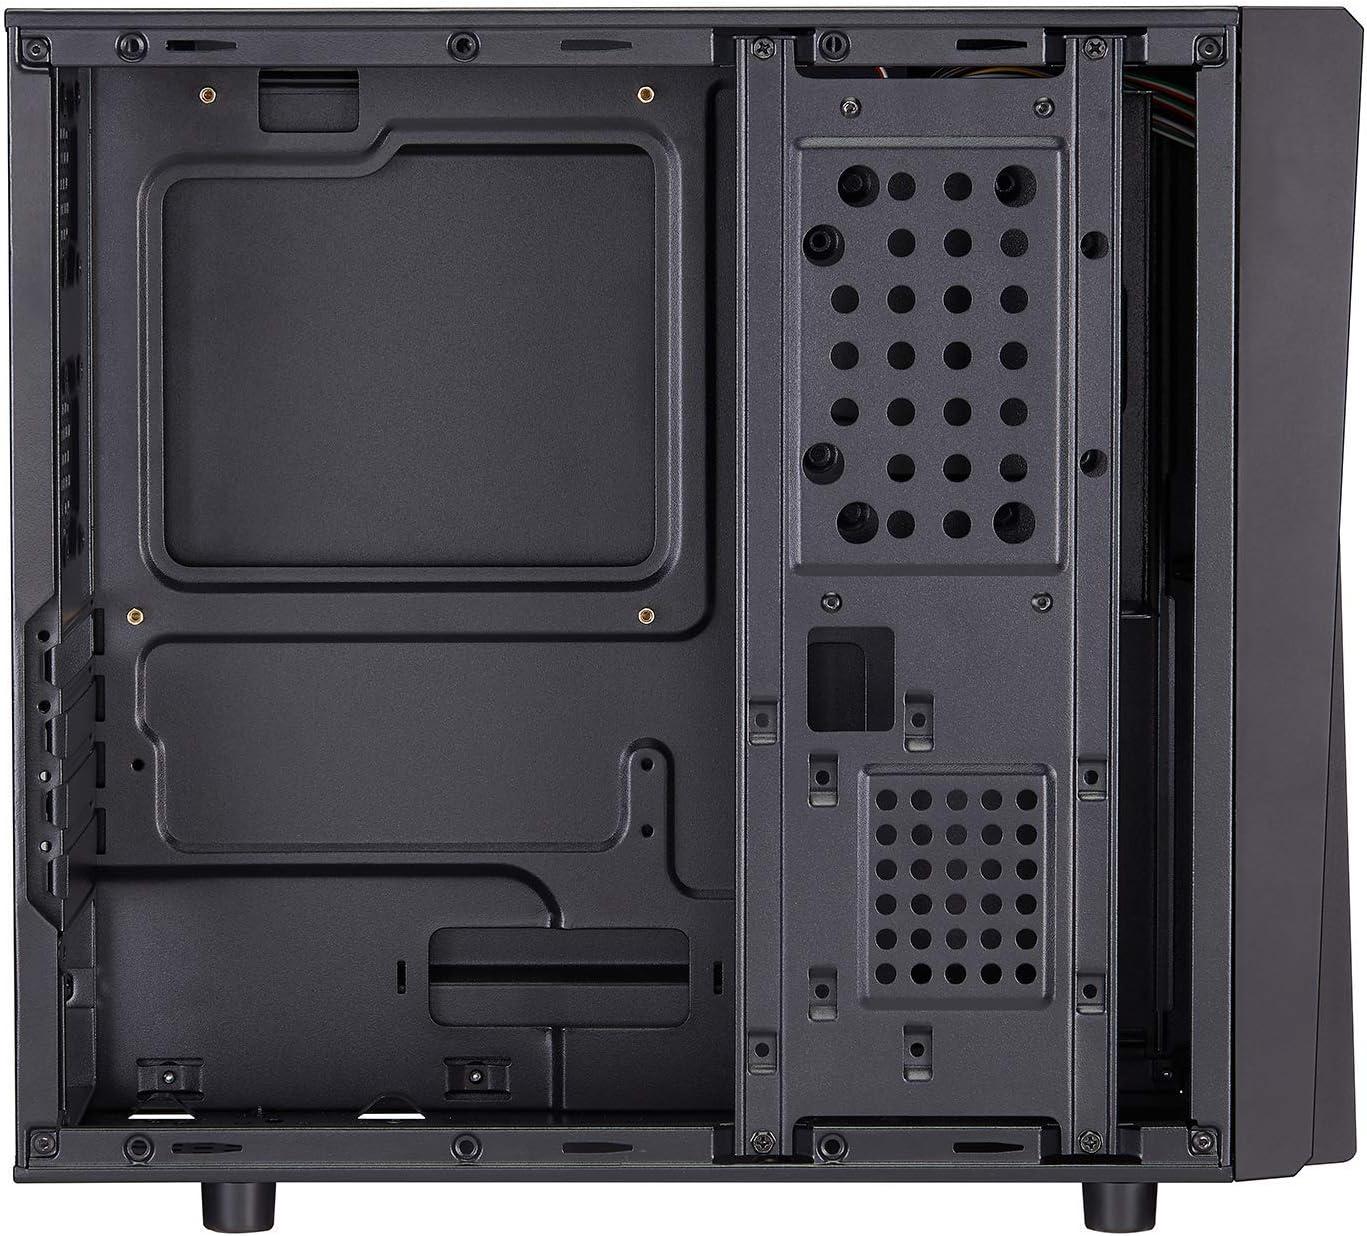 CST110 FSP Mini Tower Micro ATX Mini ITX Computer Gaming Case